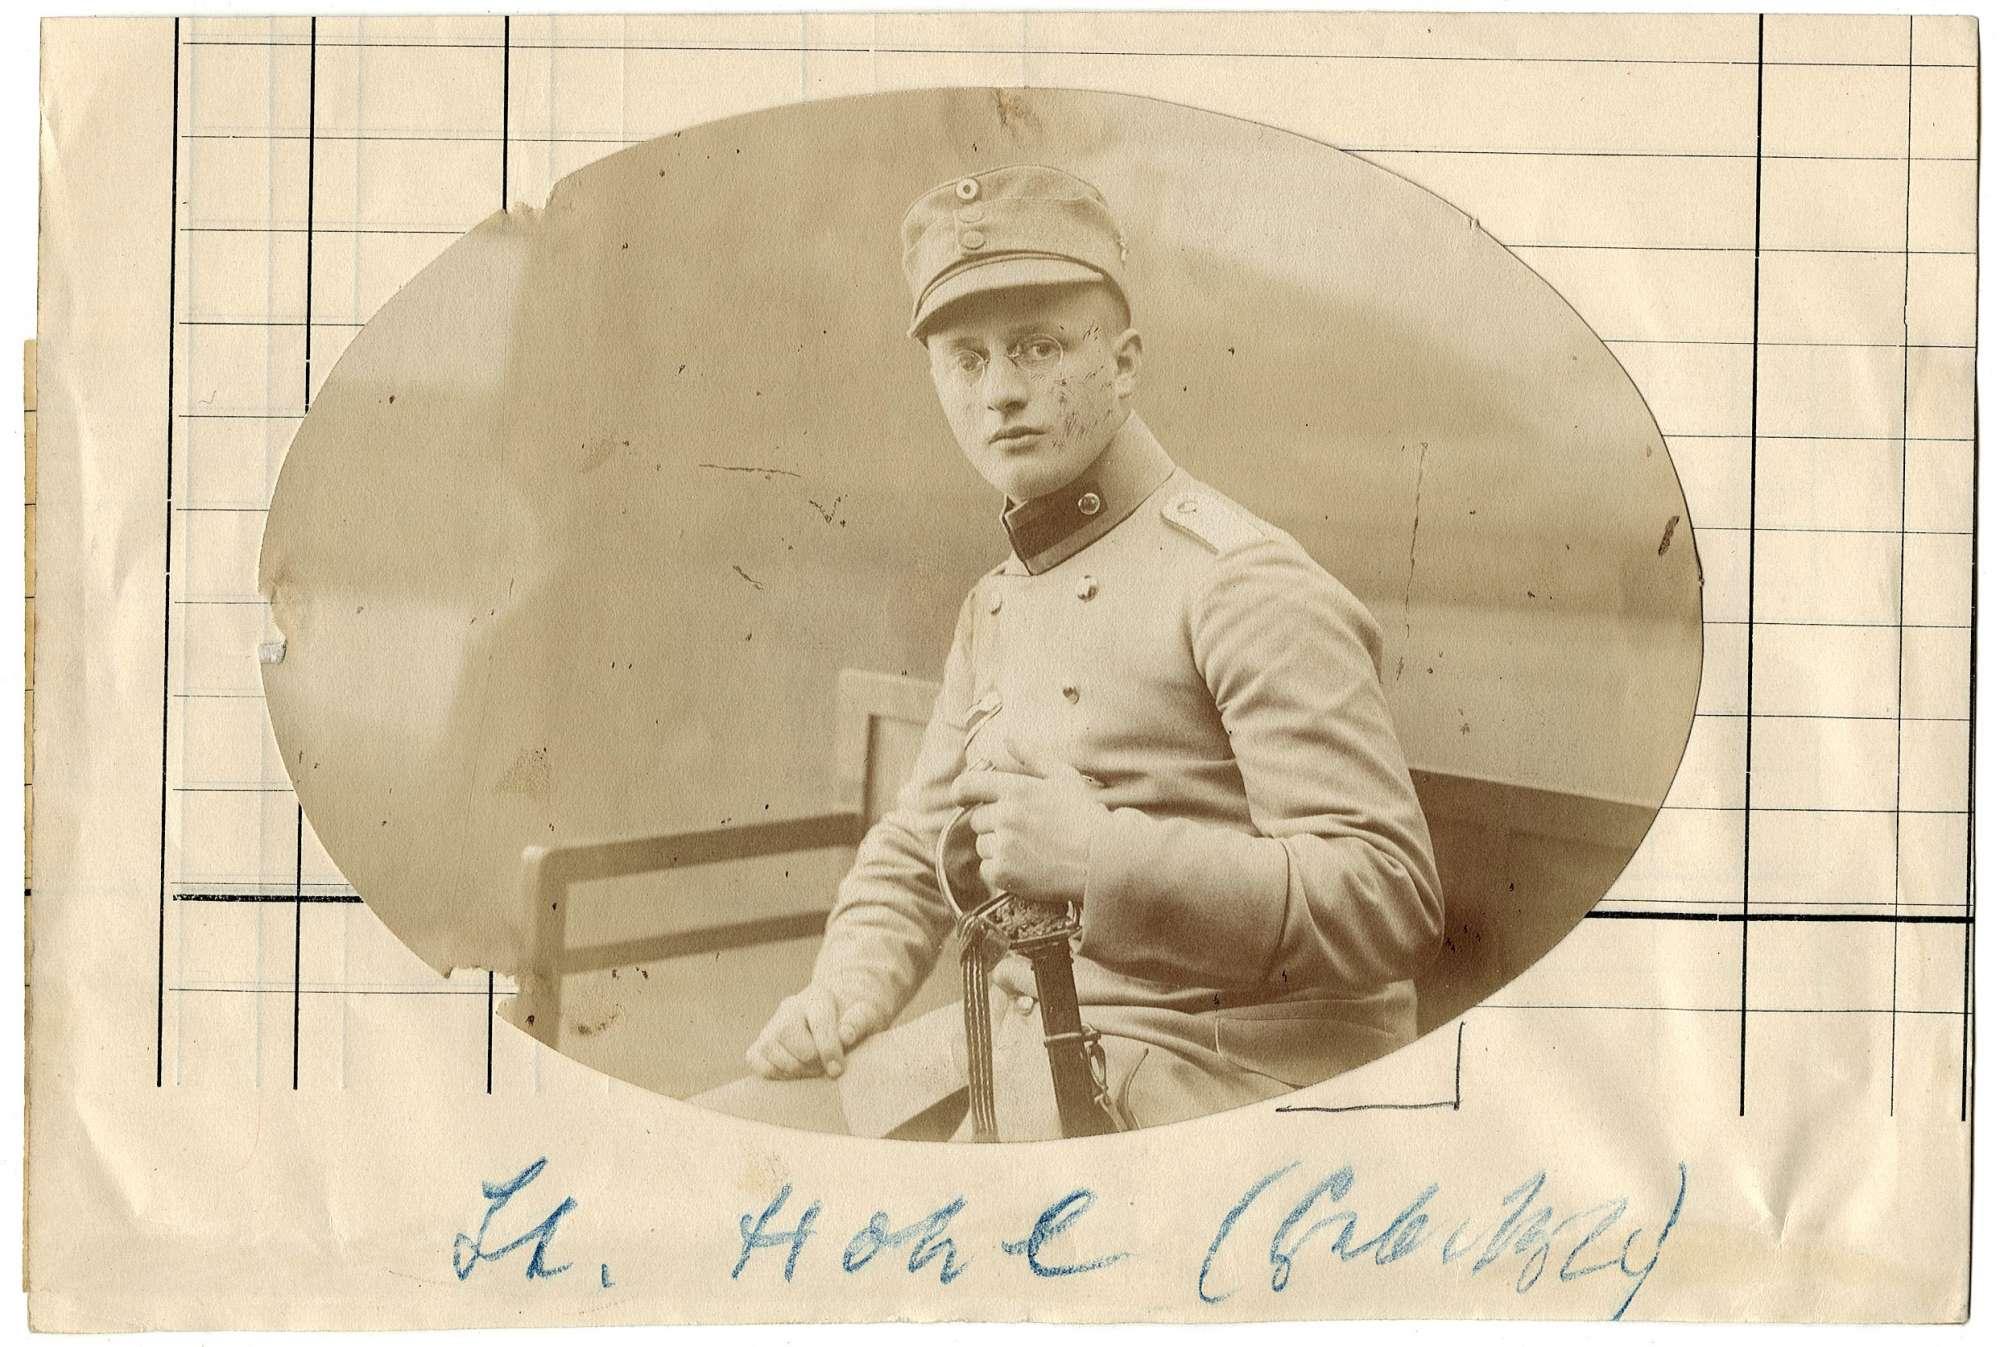 Hohl, Walther, Bild 2